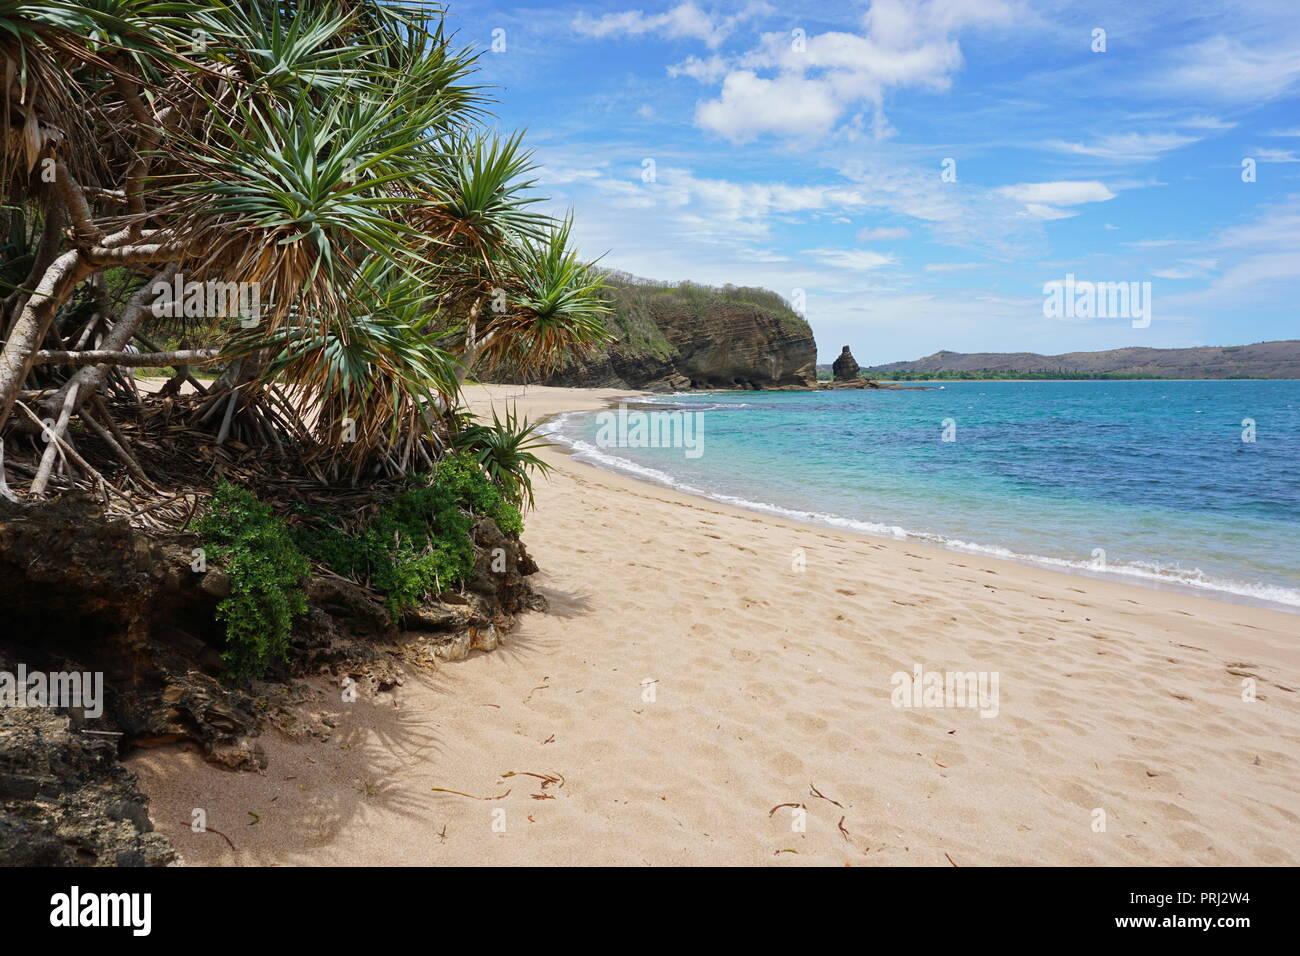 Pandanus on the beach shore in New Caledonia, Bourail, Grande Terre, south Pacific, Oceania - Stock Image